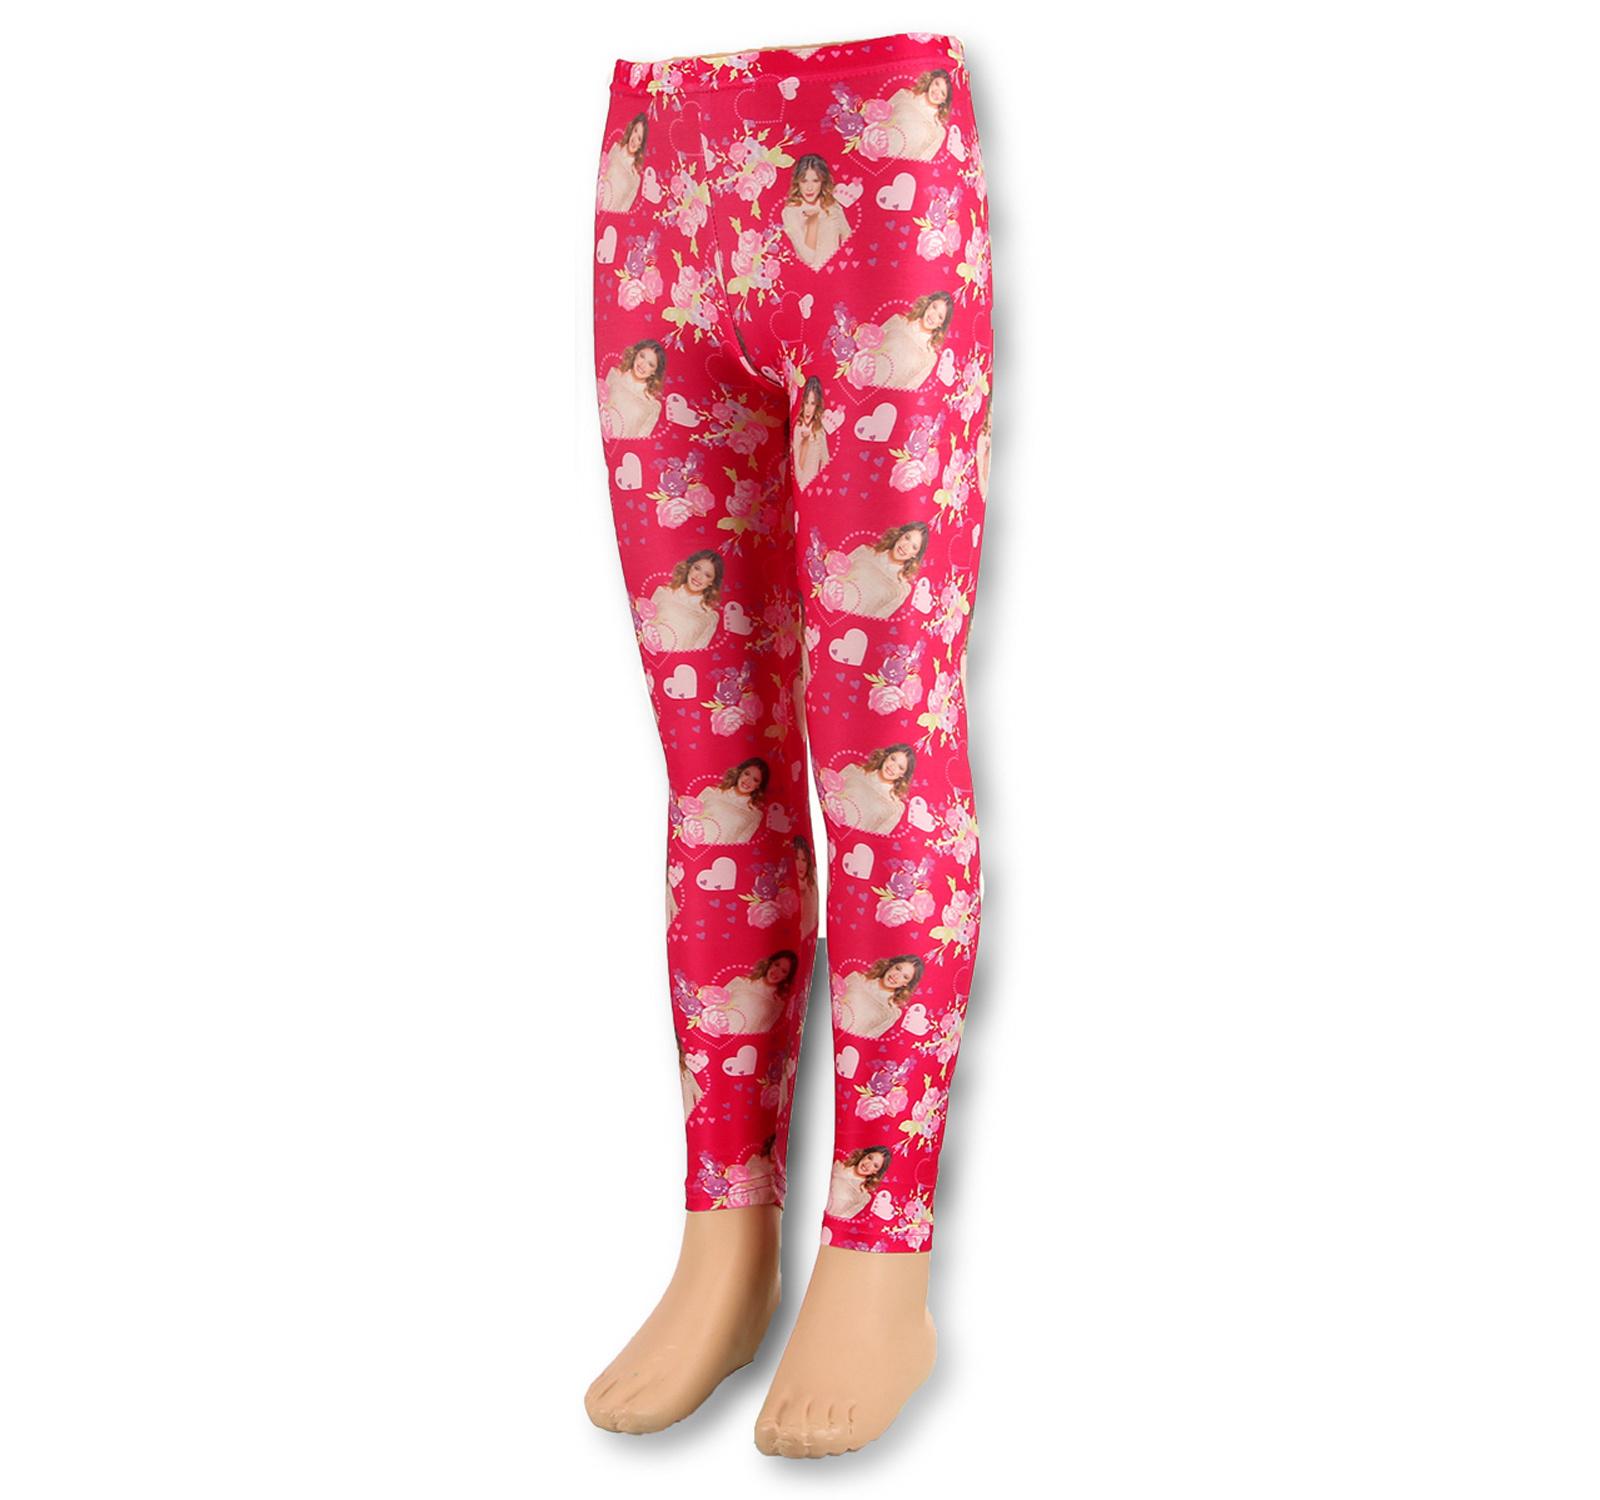 Lungi Fete 116 152 Violetta Leggins Pantaloni ® O1qwqPTx8